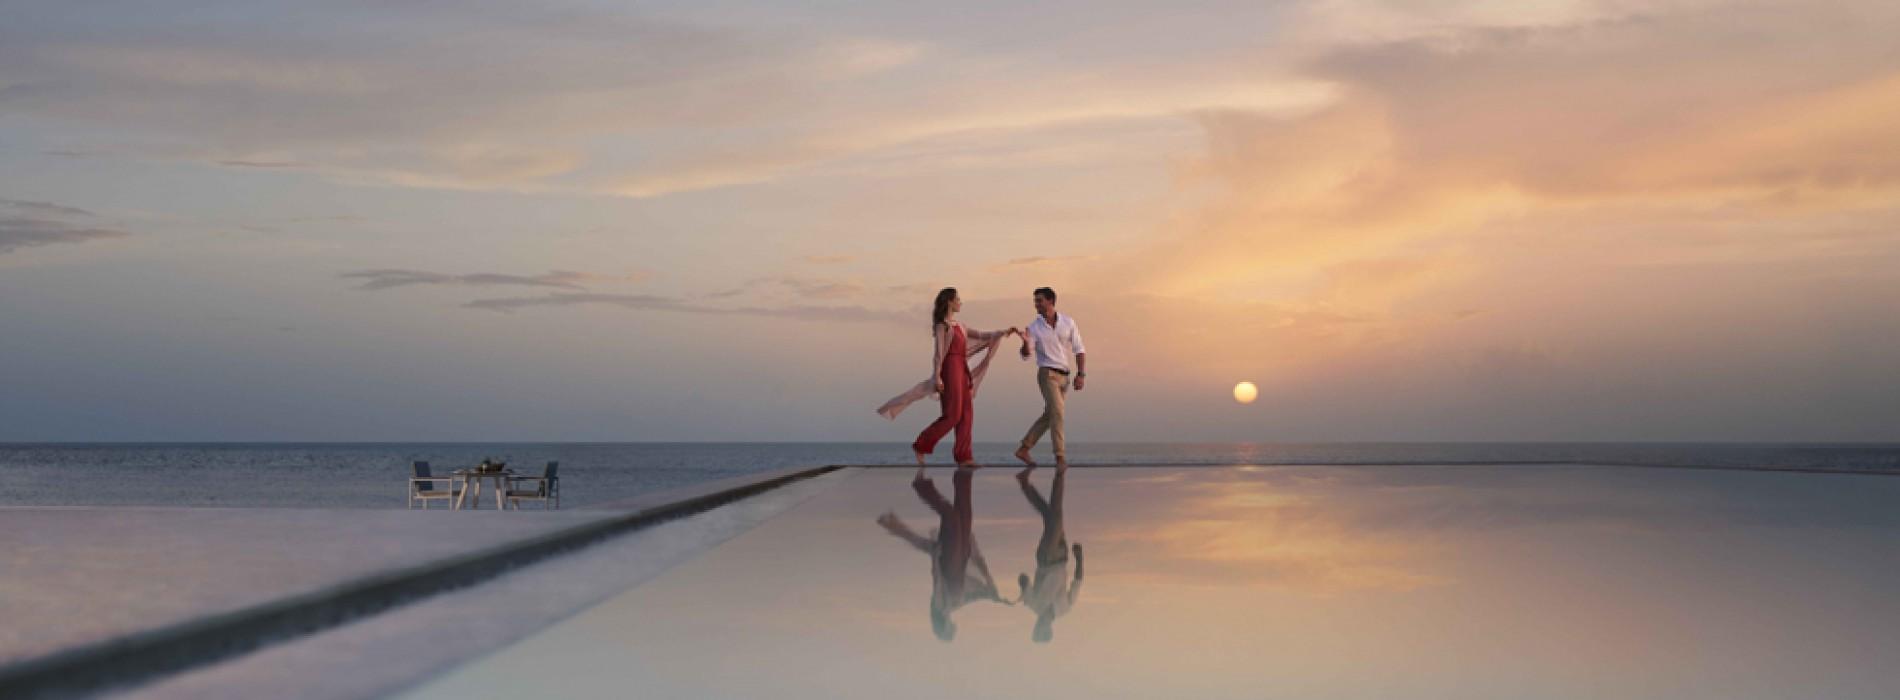 TCA Abu Dhabi launches new global destination campaign